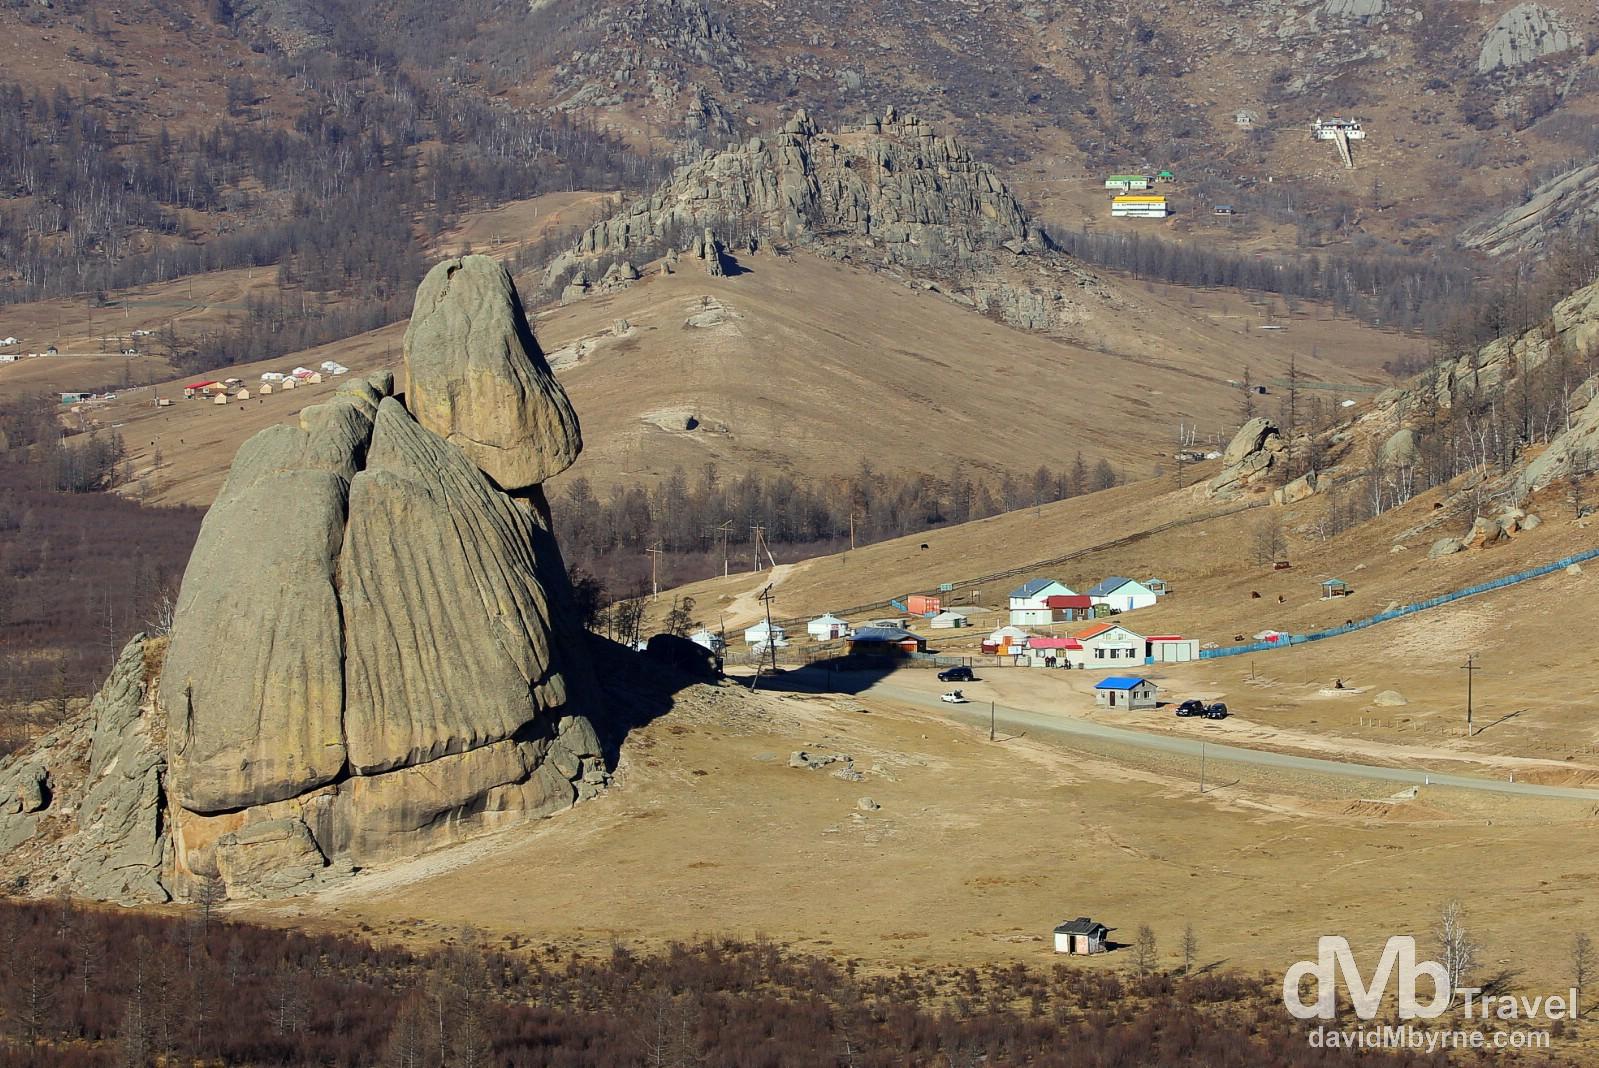 Turtle Rock overshadows a small settlement in Terelj National Park, Mongolia. November 3rd 2012.